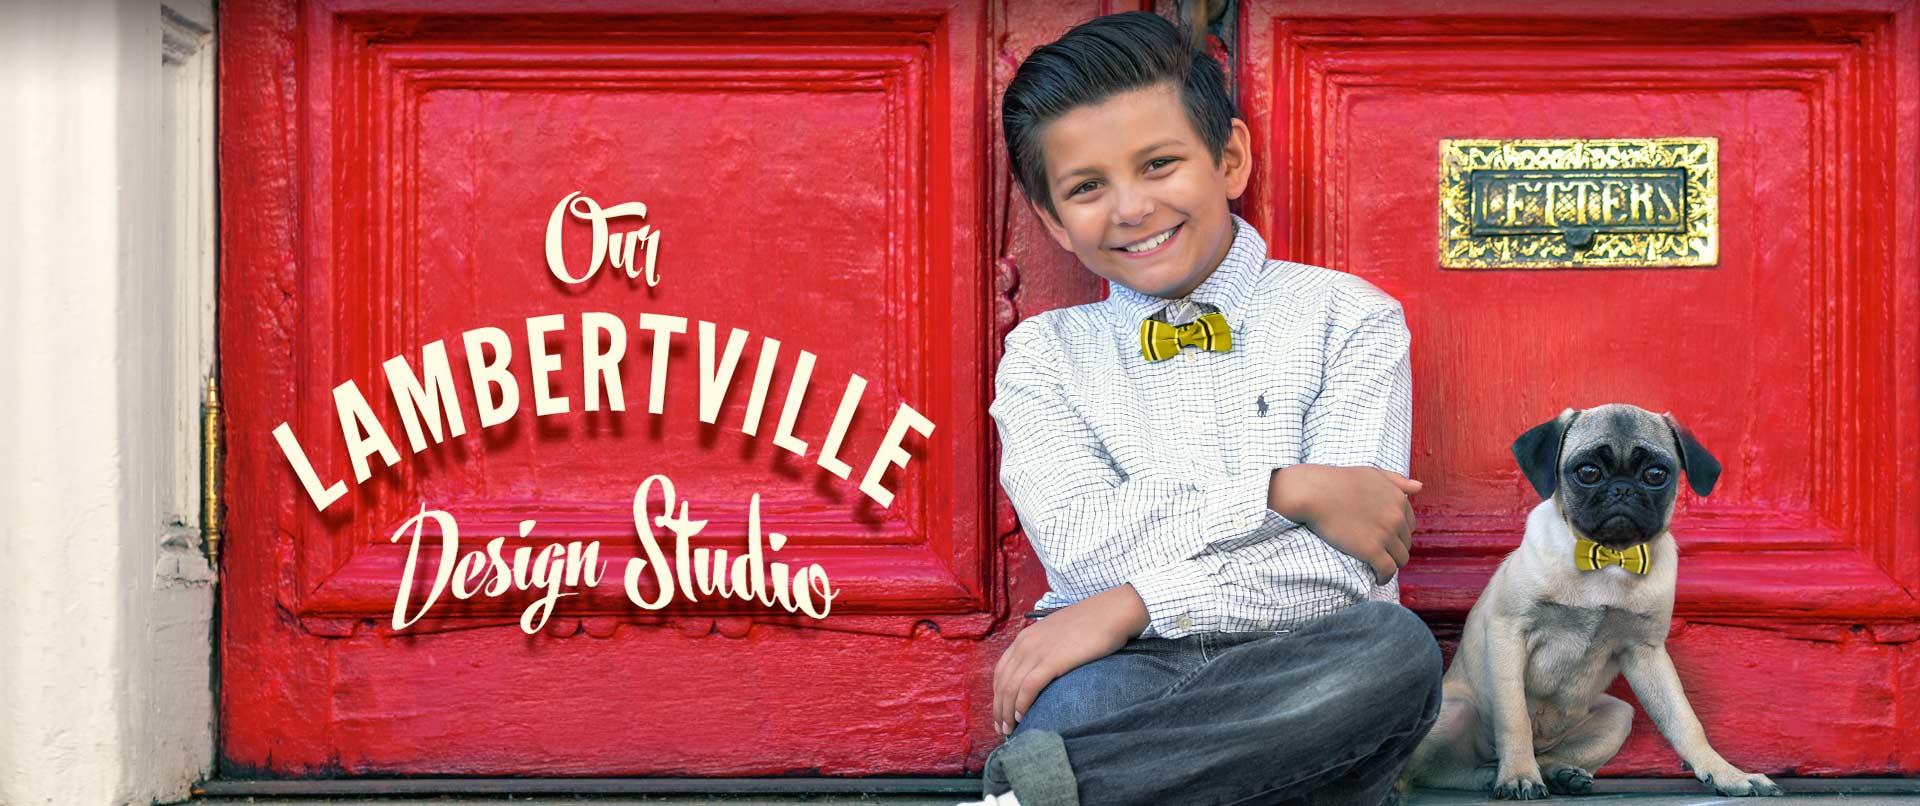 Lambertville New Jersey Design Studio